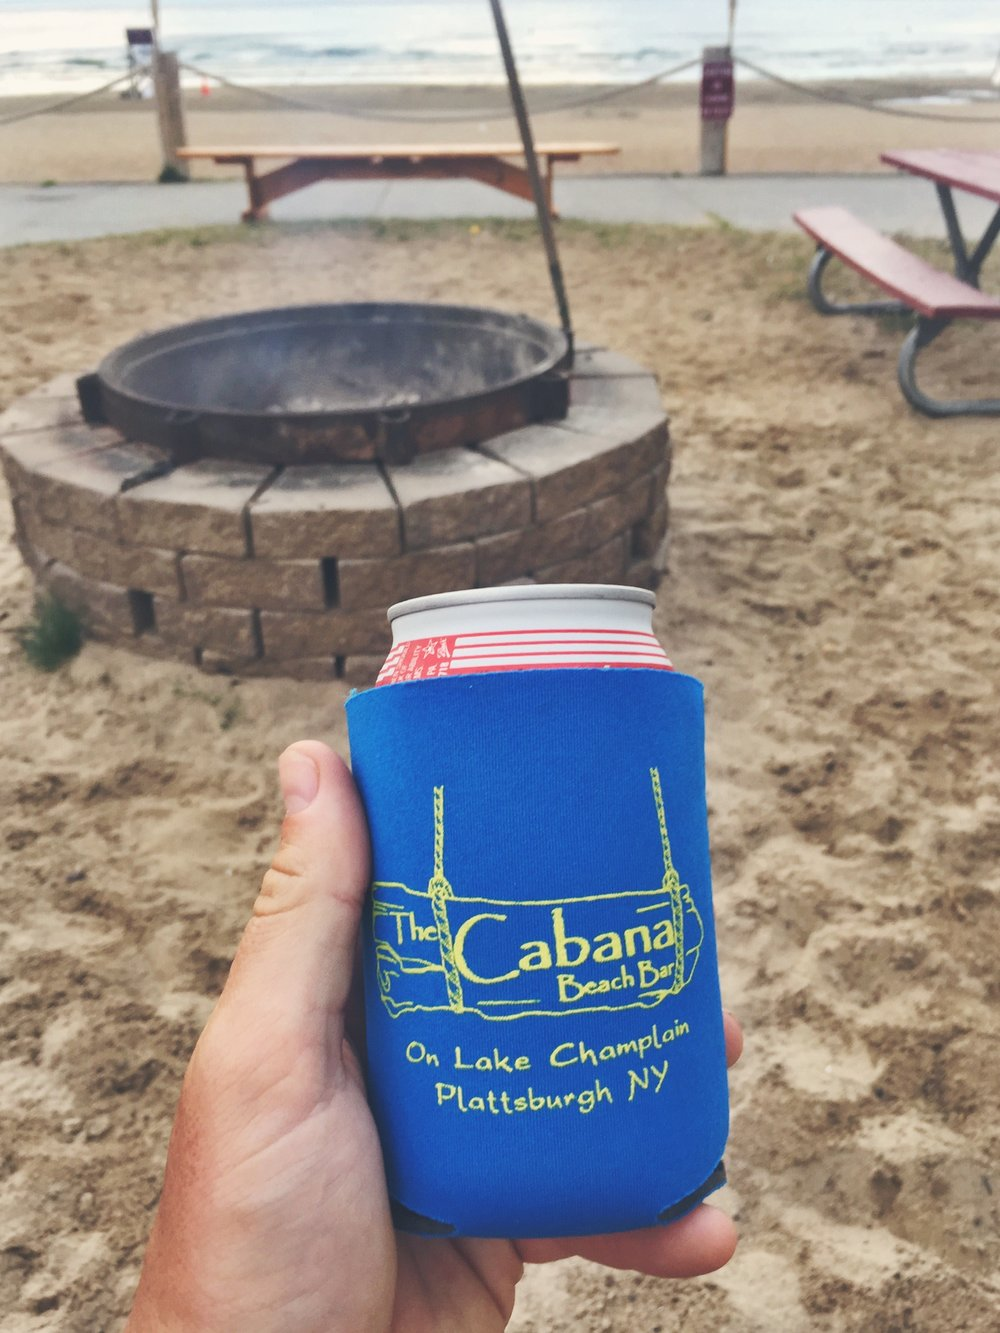 Enjoying a beer at the state beach Cabana